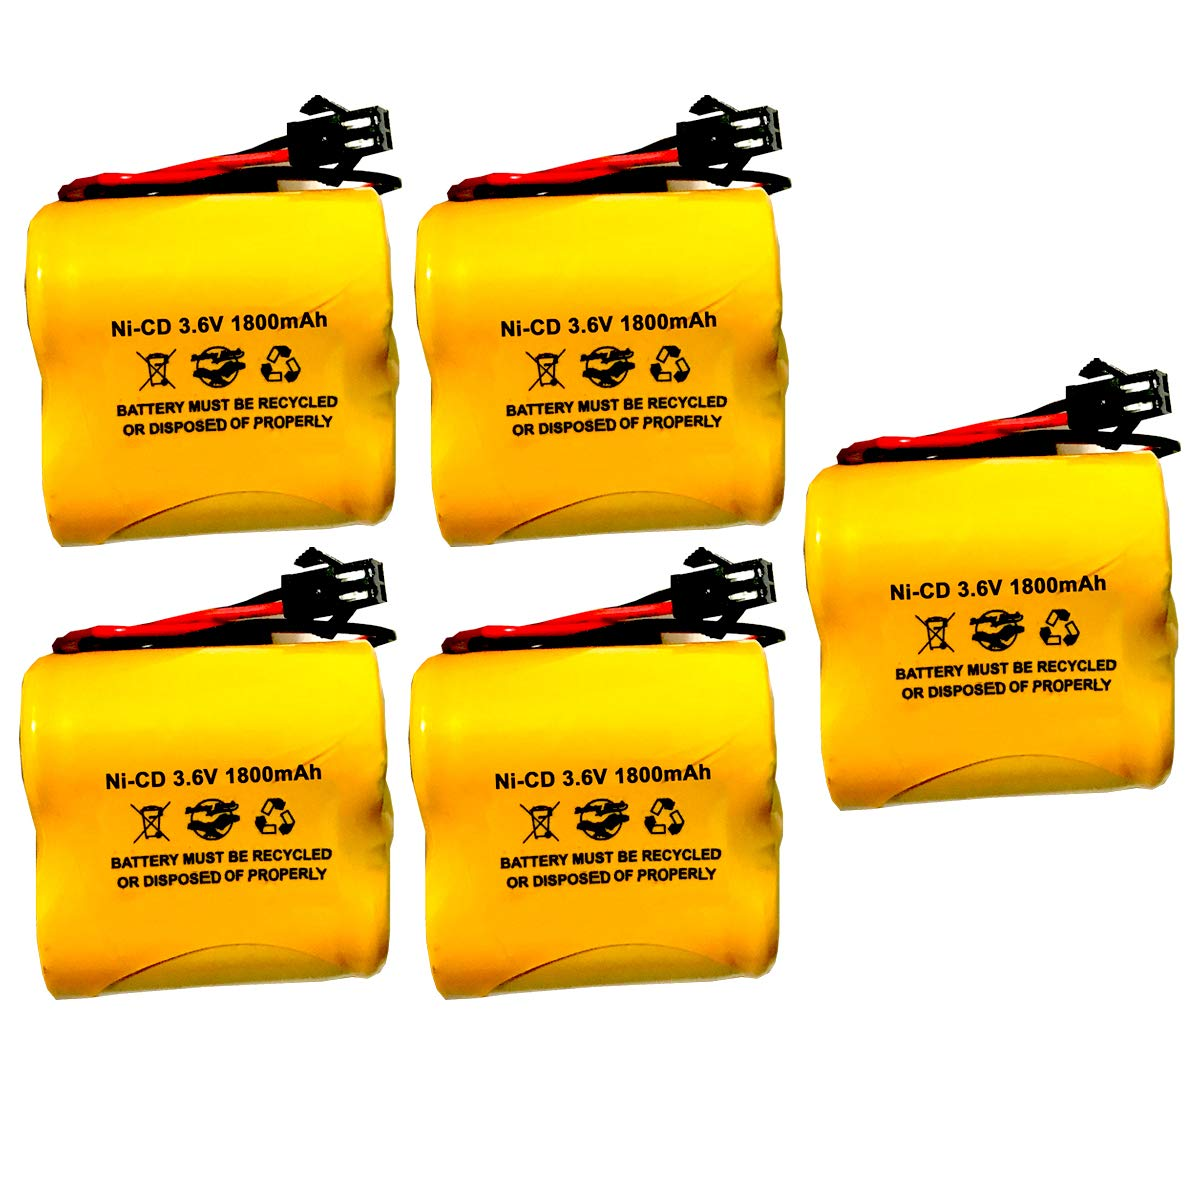 (5 Pack) OSA269 NIC1671 3.6v 1800mah Ni-CD Battery Pack for exit Sign Emergency Light Lithonia Unitech SC1800mAh 3.6V ELB-B002 ELBB002 745975931774 LITELBB002 by Battery Hawk, LLC